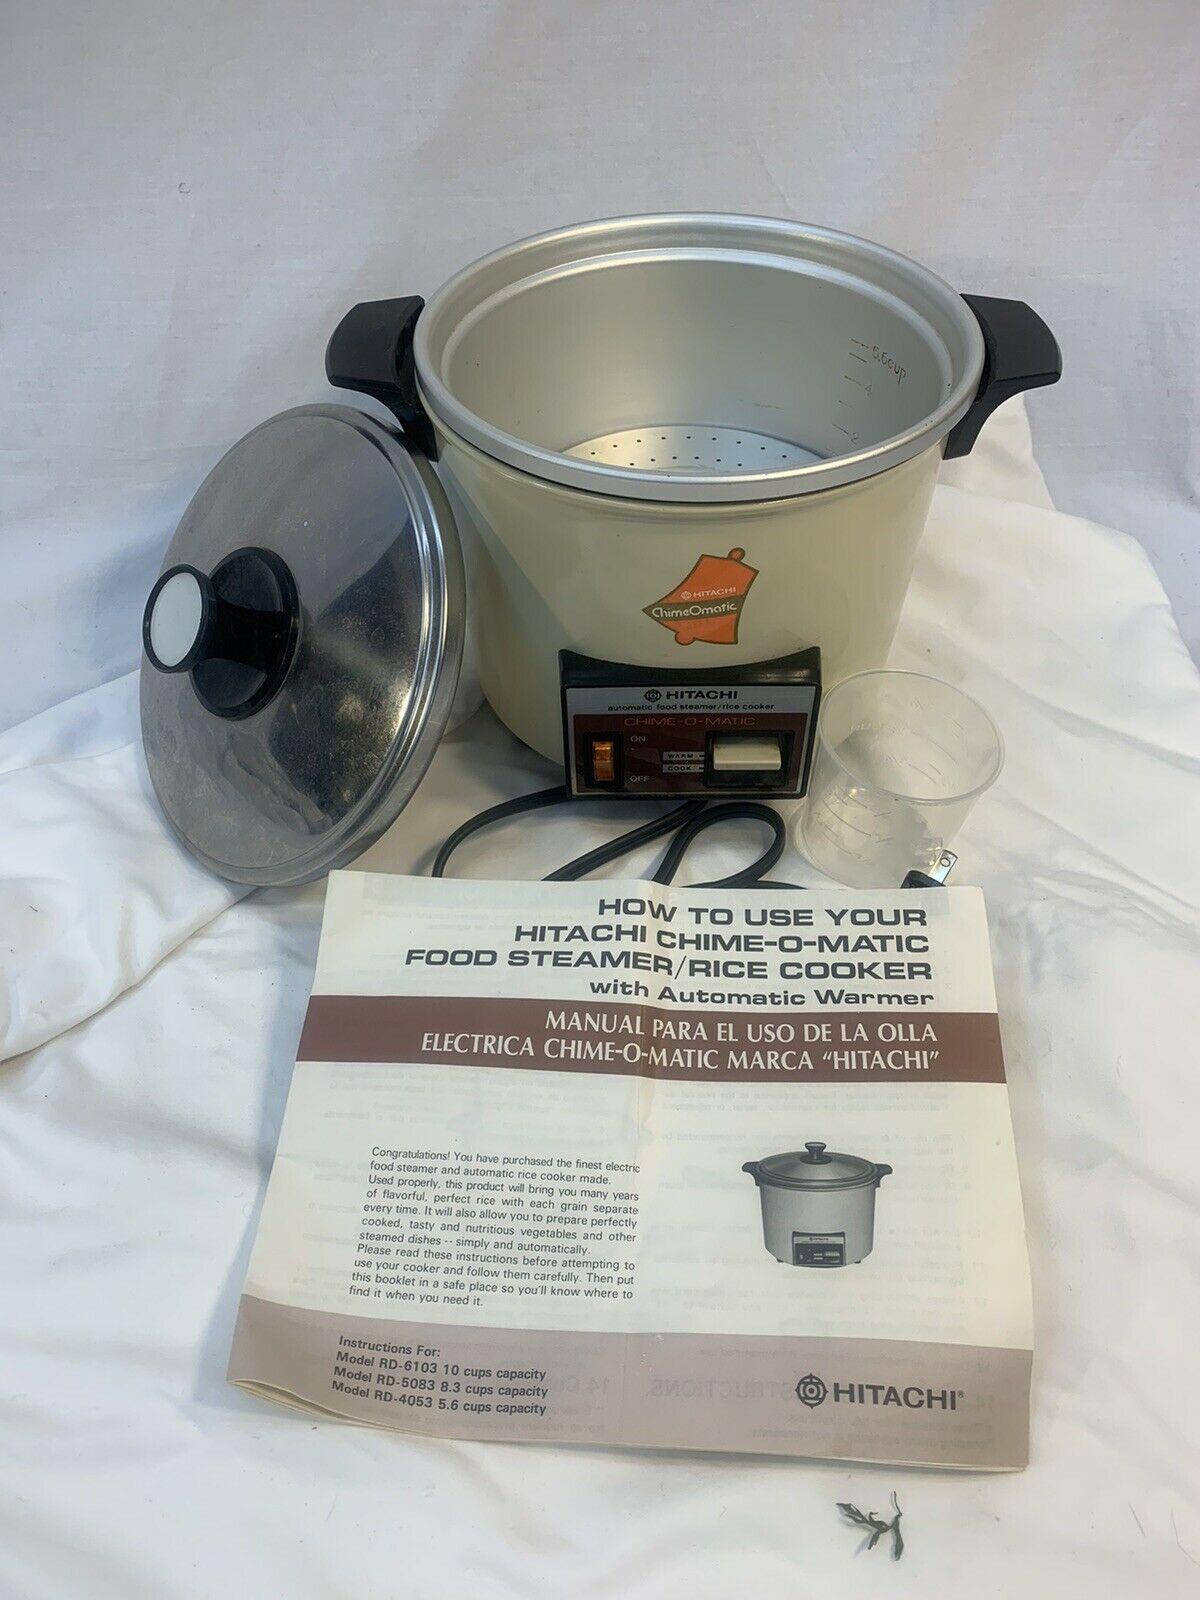 Details about Vintage Hitachi Chime-O-Matic 405P Automatic